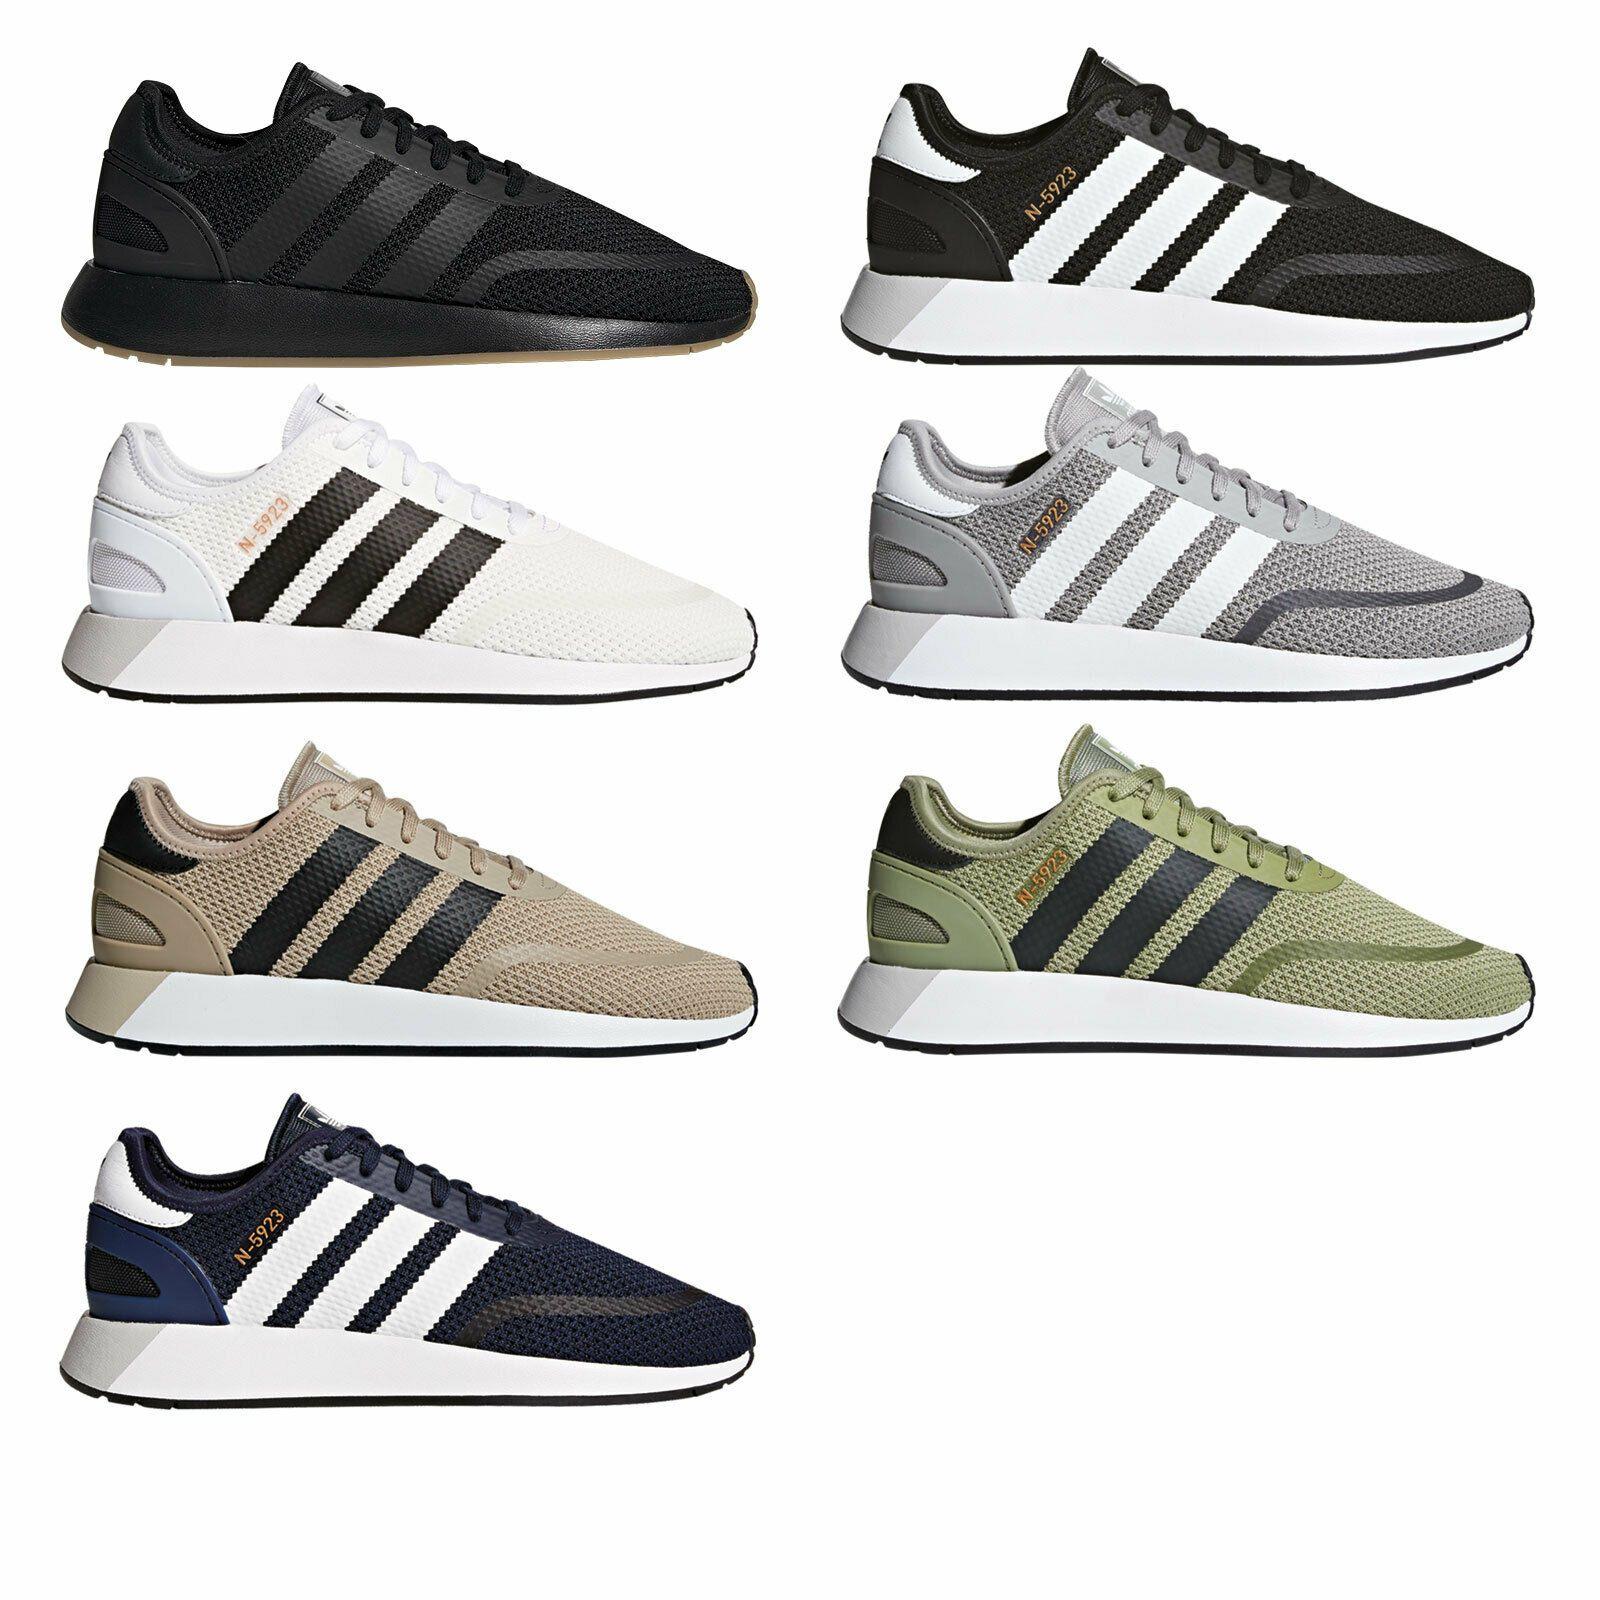 Adidas Original Iniki N 5923 Baskets pour Hommes Chaussures